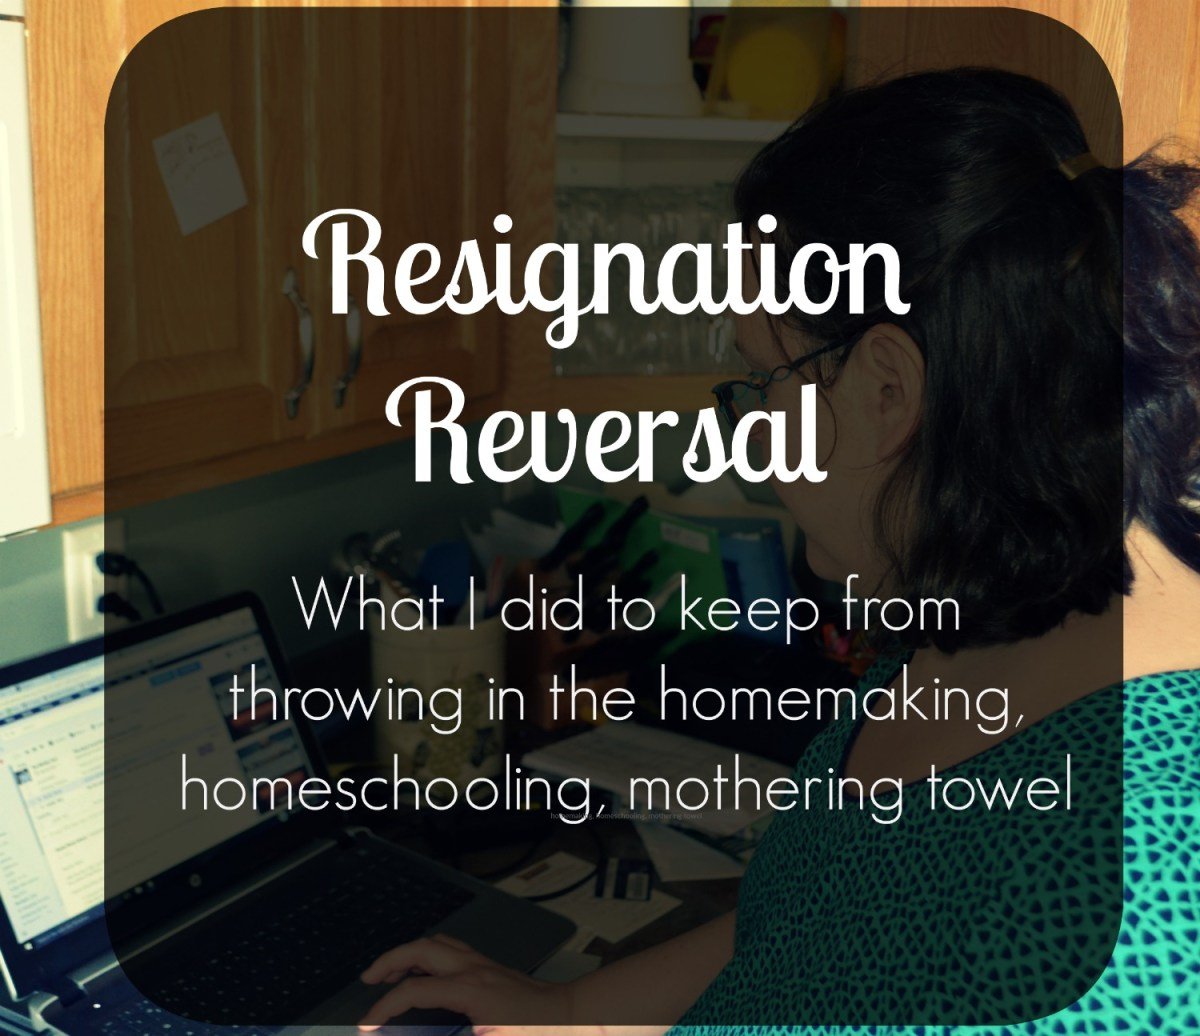 A Resignation Reversal